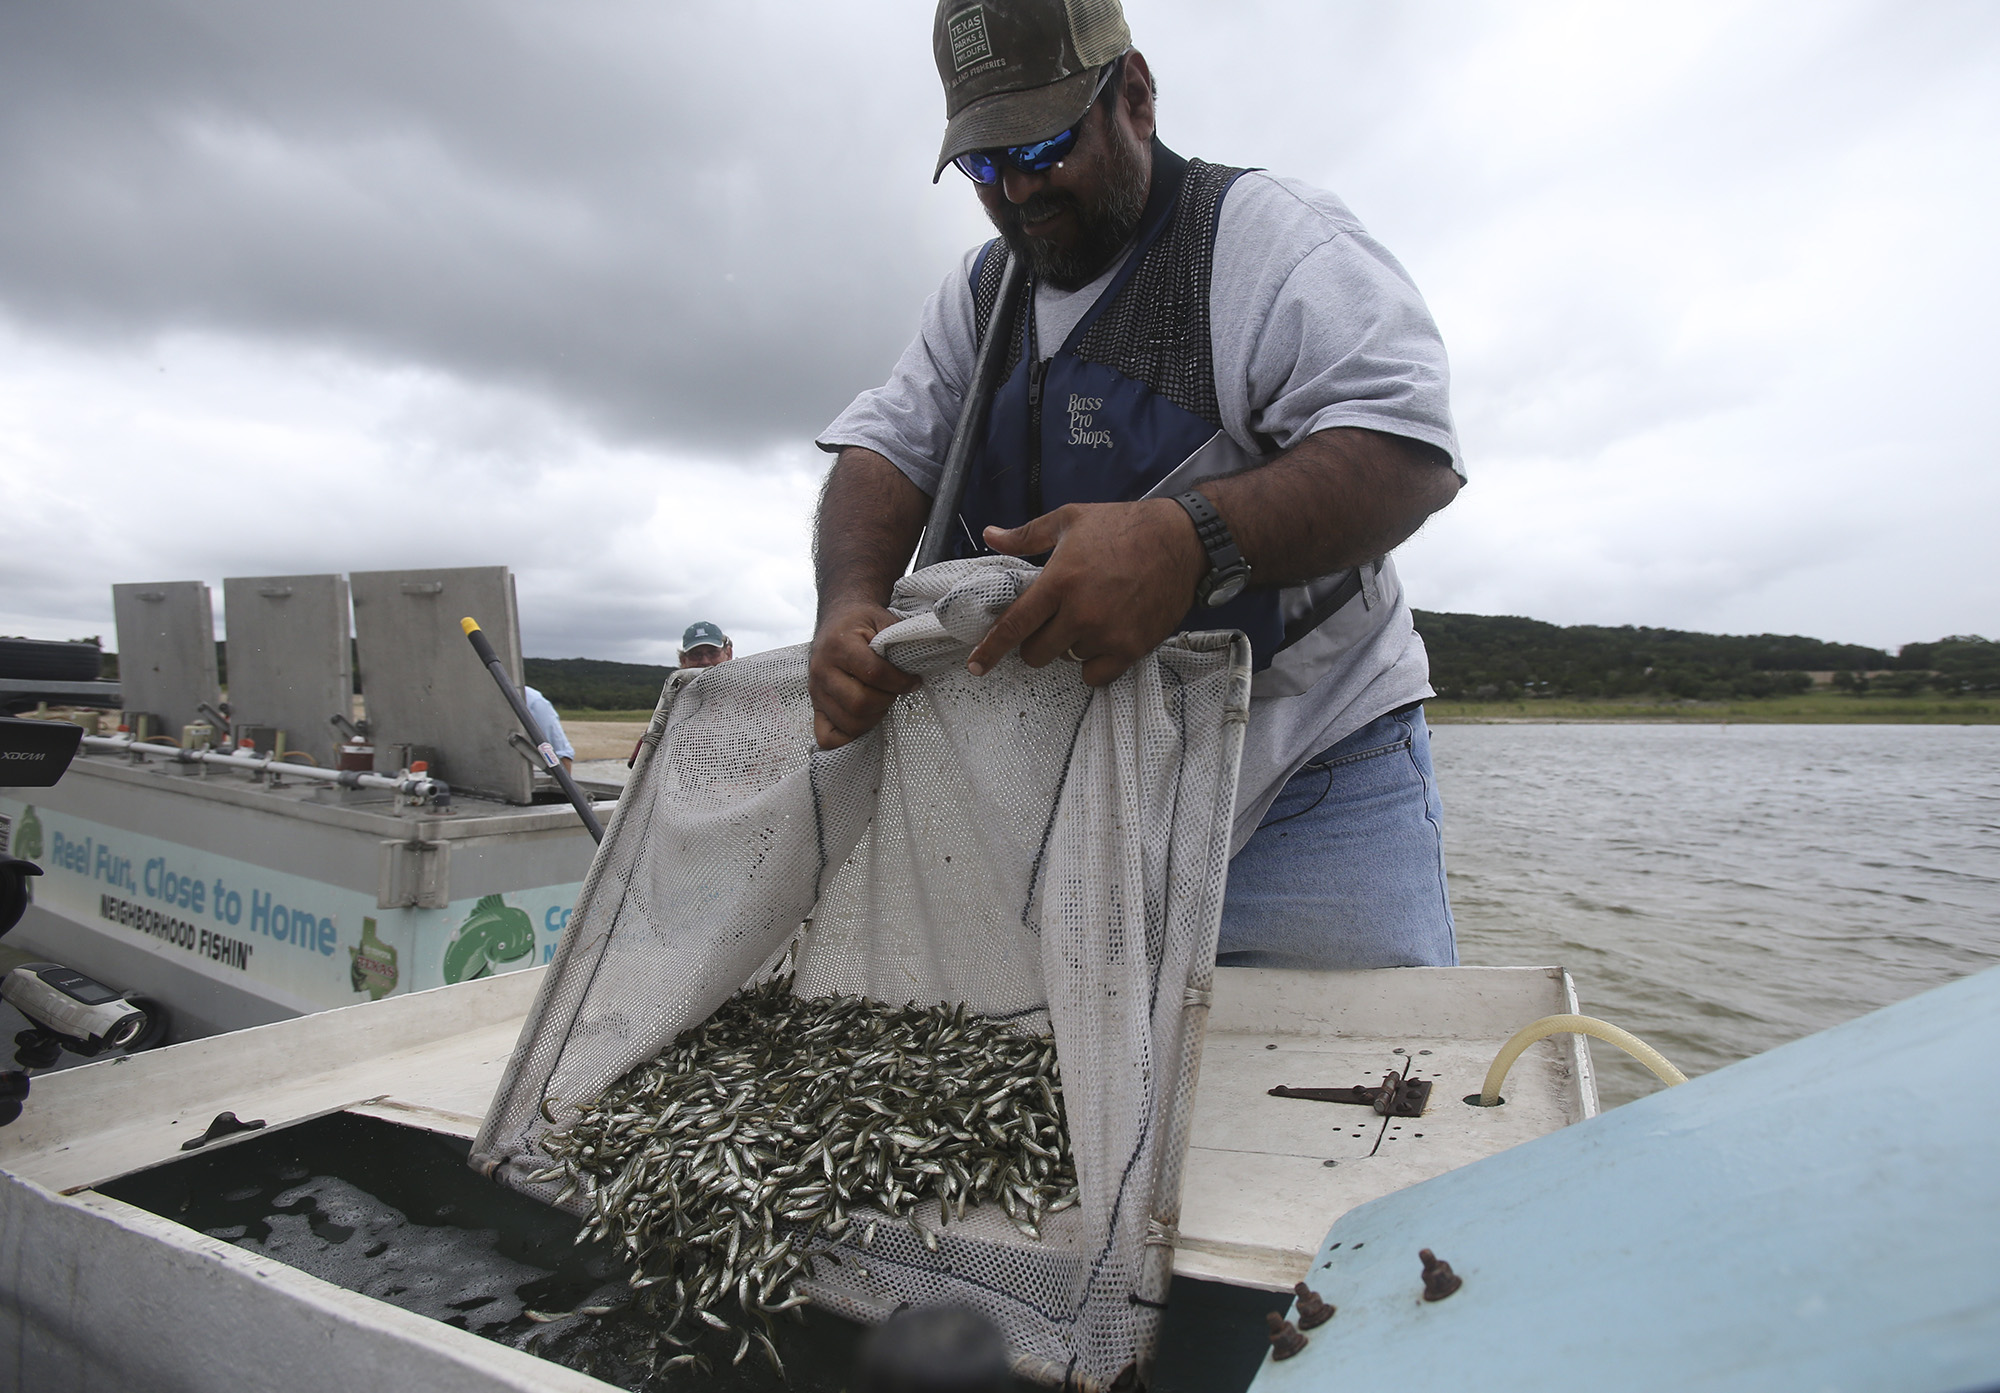 Stocking up for future fish stories san antonio express news for Fish stocking texas